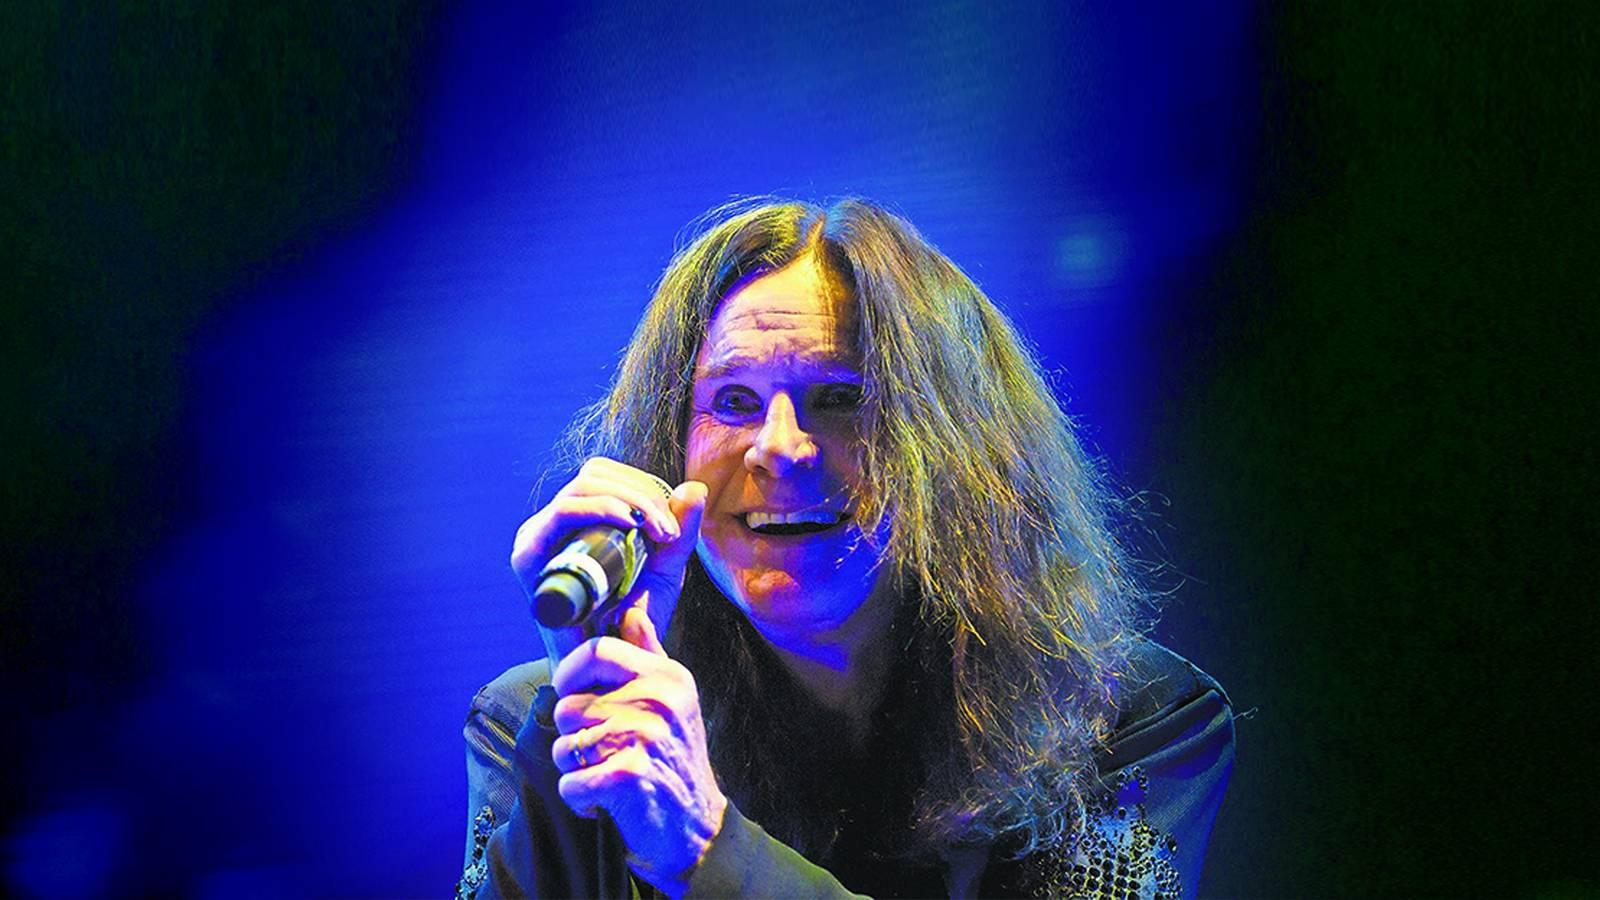 Ozzy Osbourne (Rescheduled from 6/4/2019)